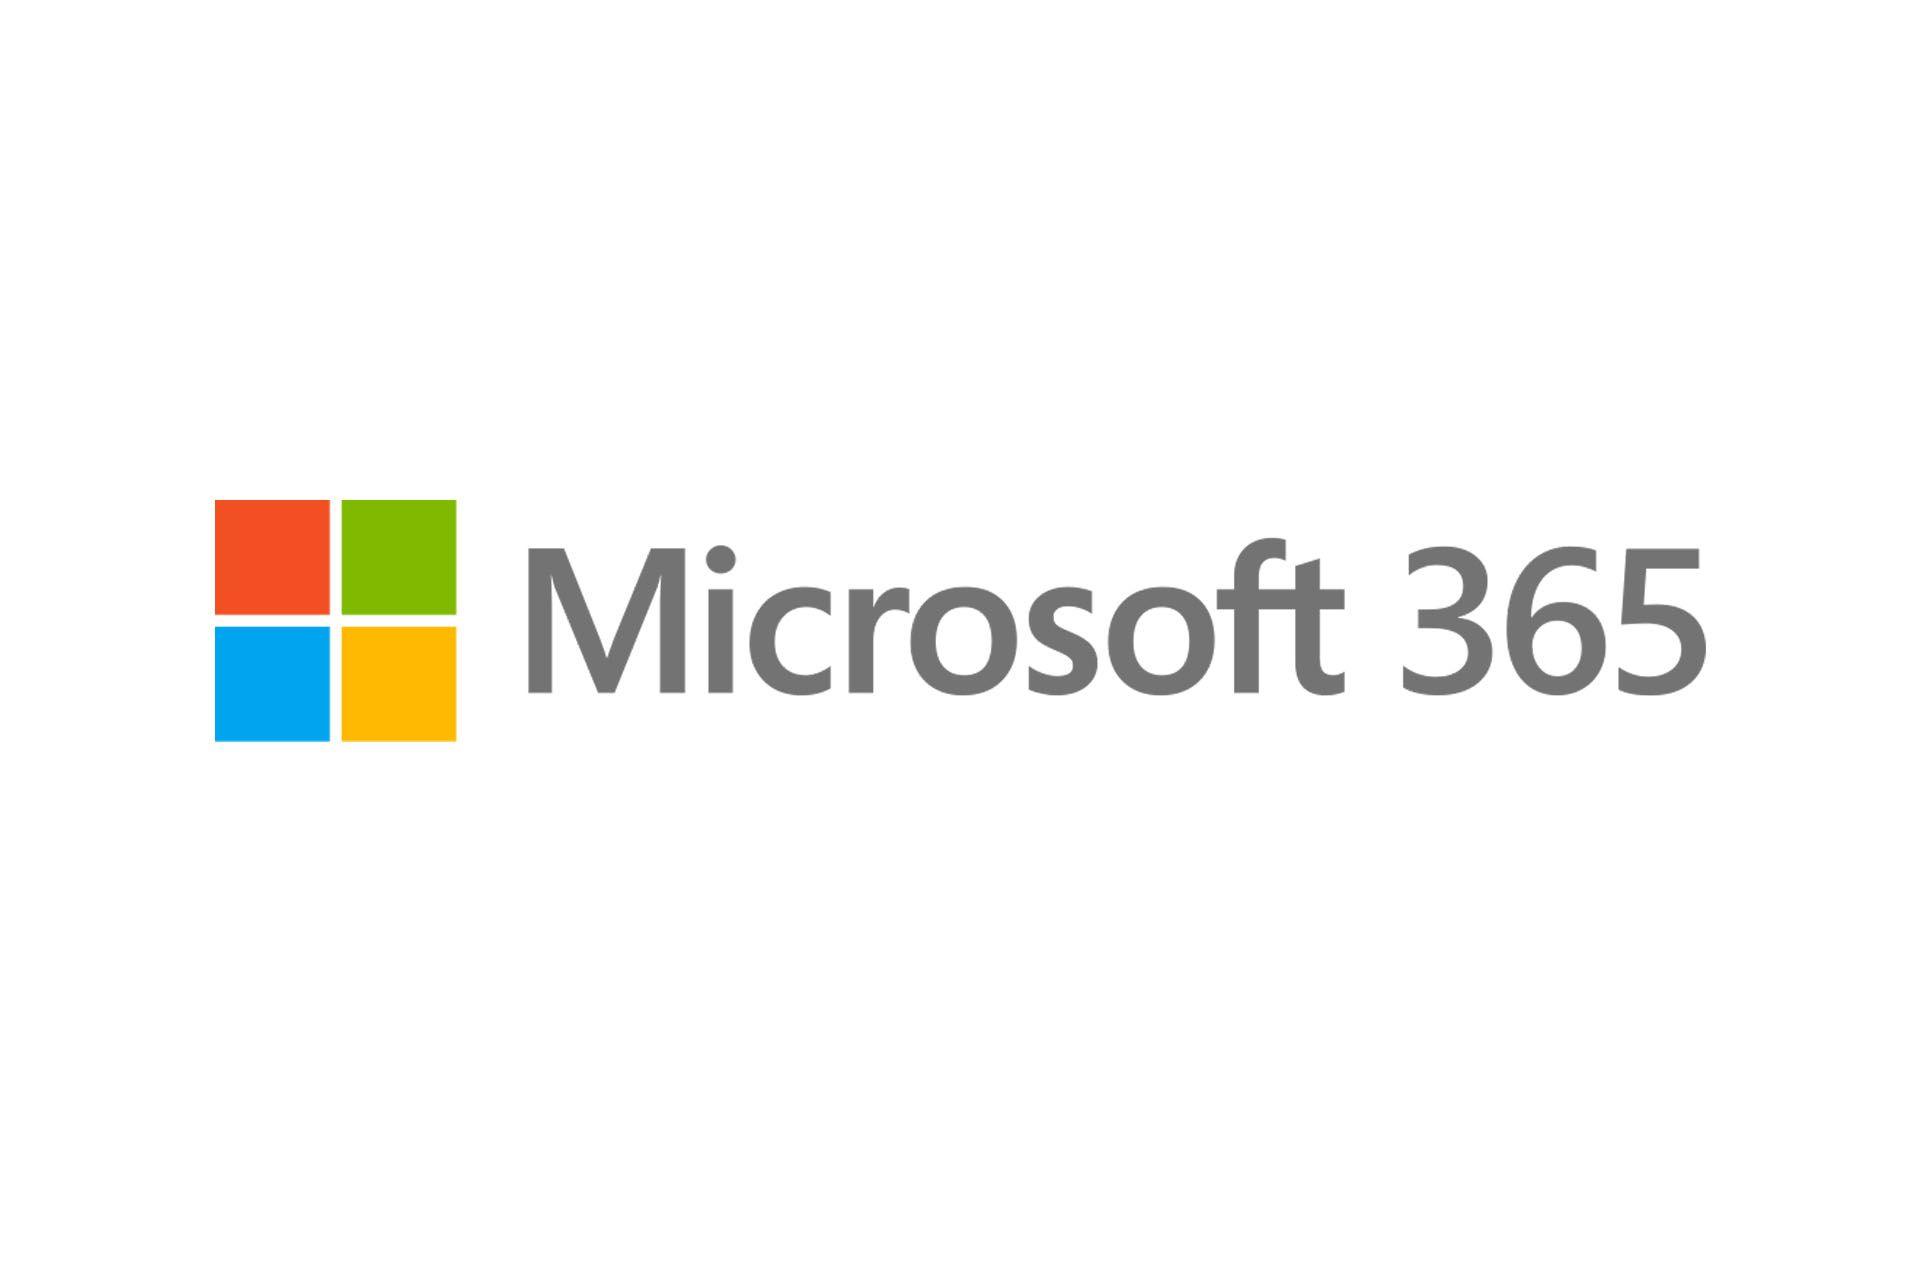 Microsoft 365 logo.